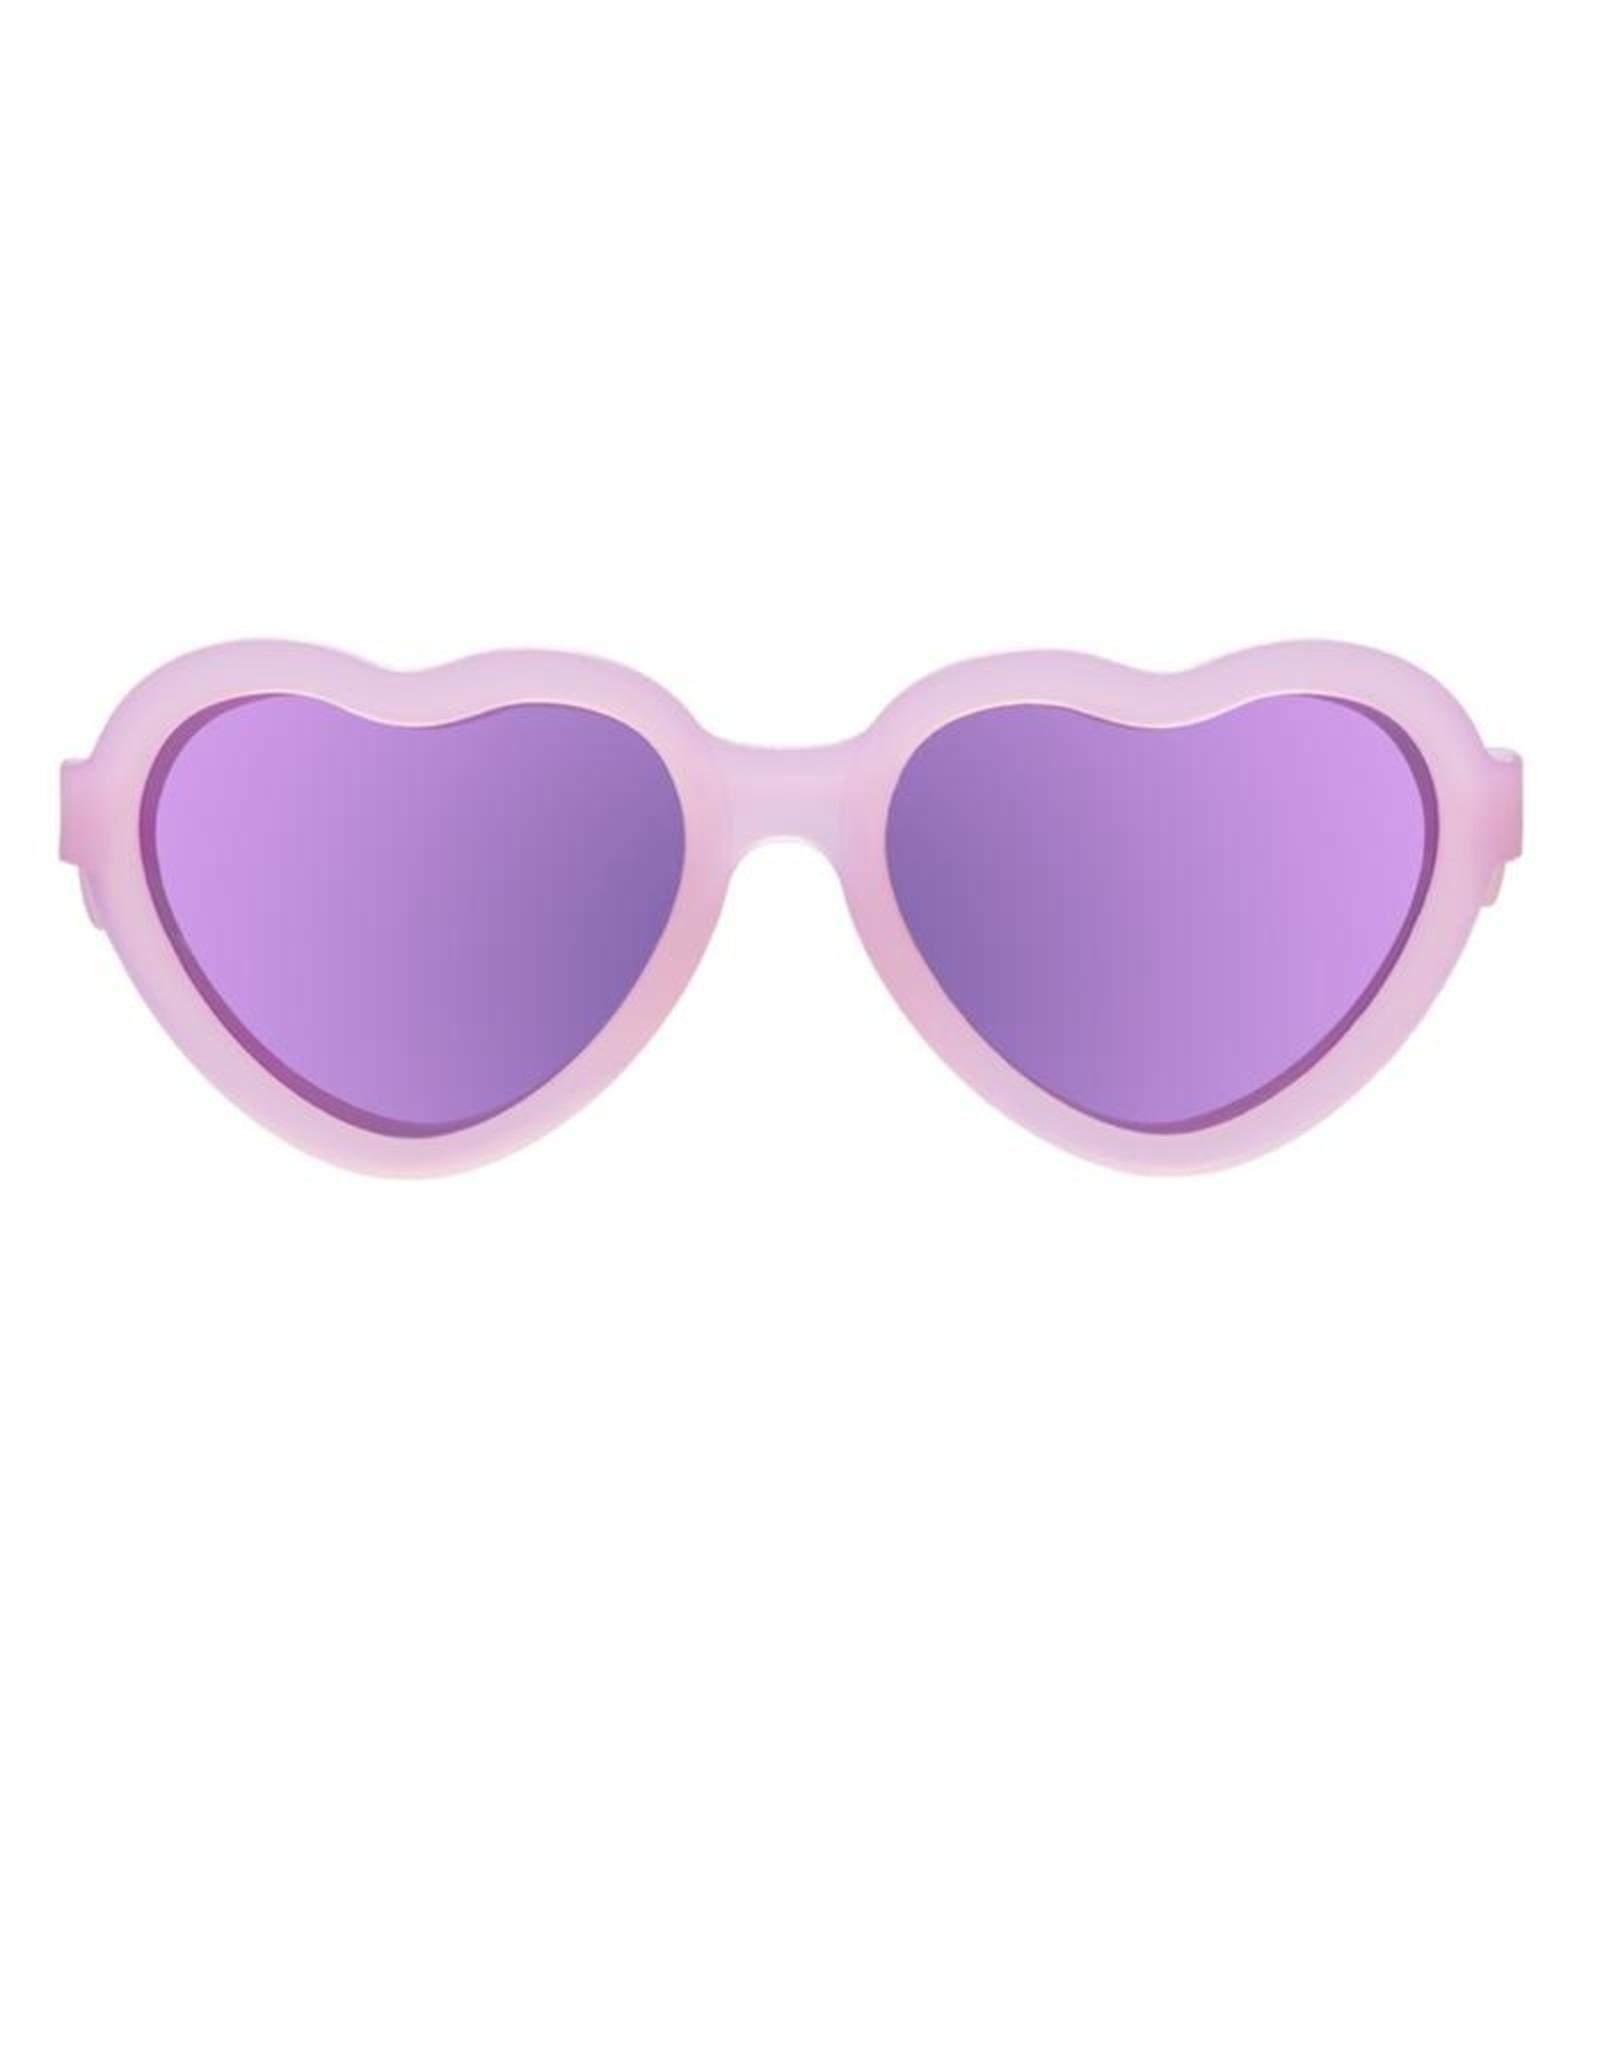 Babiators SweetHeart Polarized Sunglassesin Pink Transparent